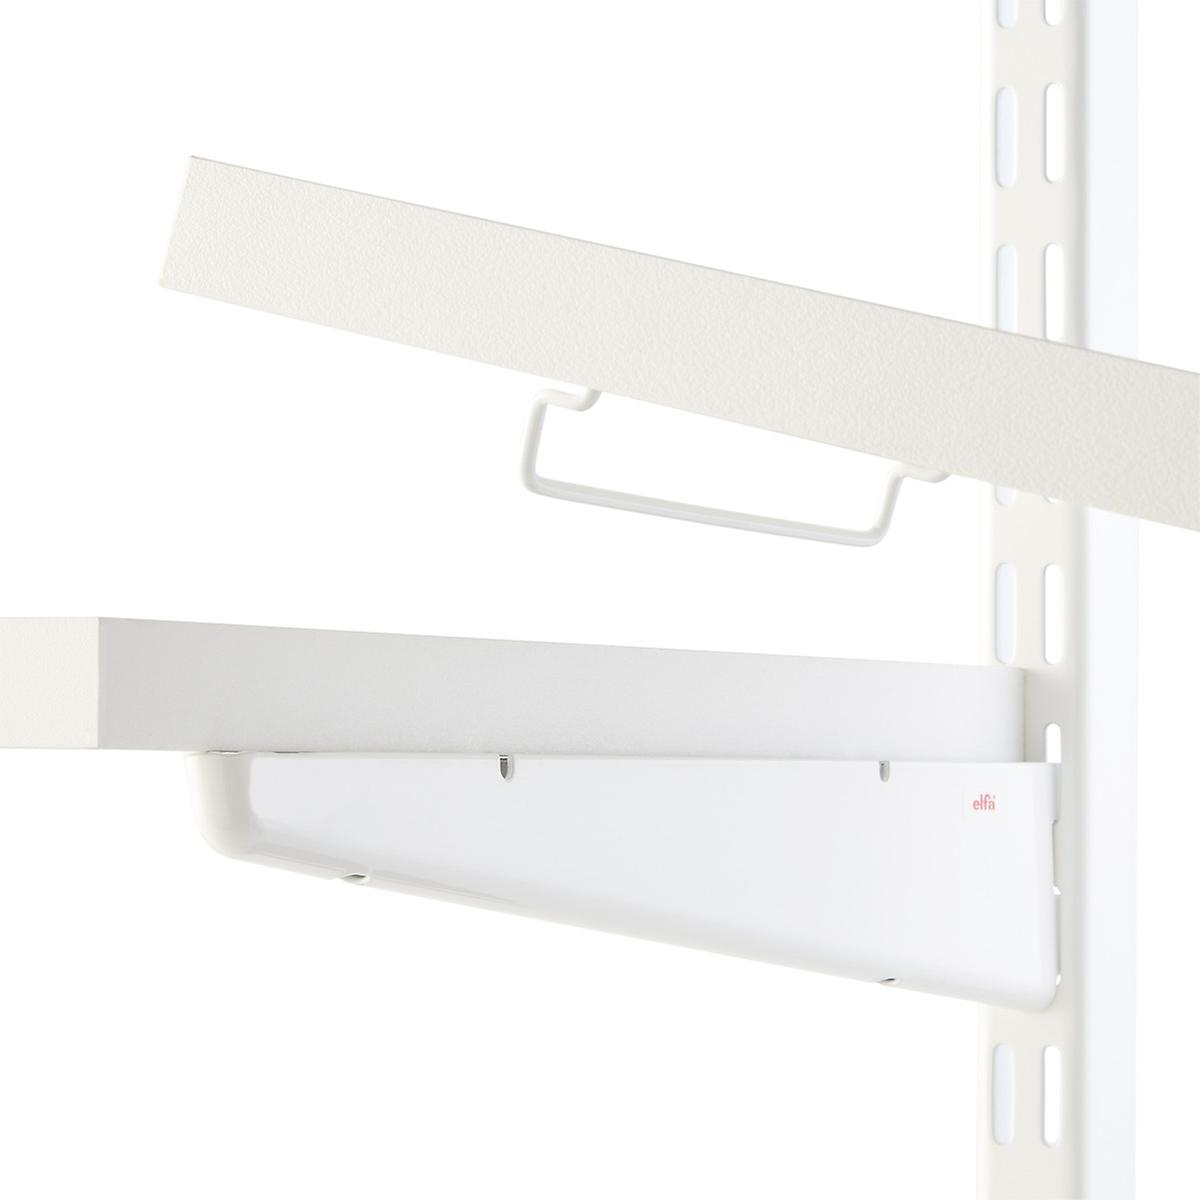 small m teak products rack ethnicraft for shelf short shelves shelving open furniture originals racks